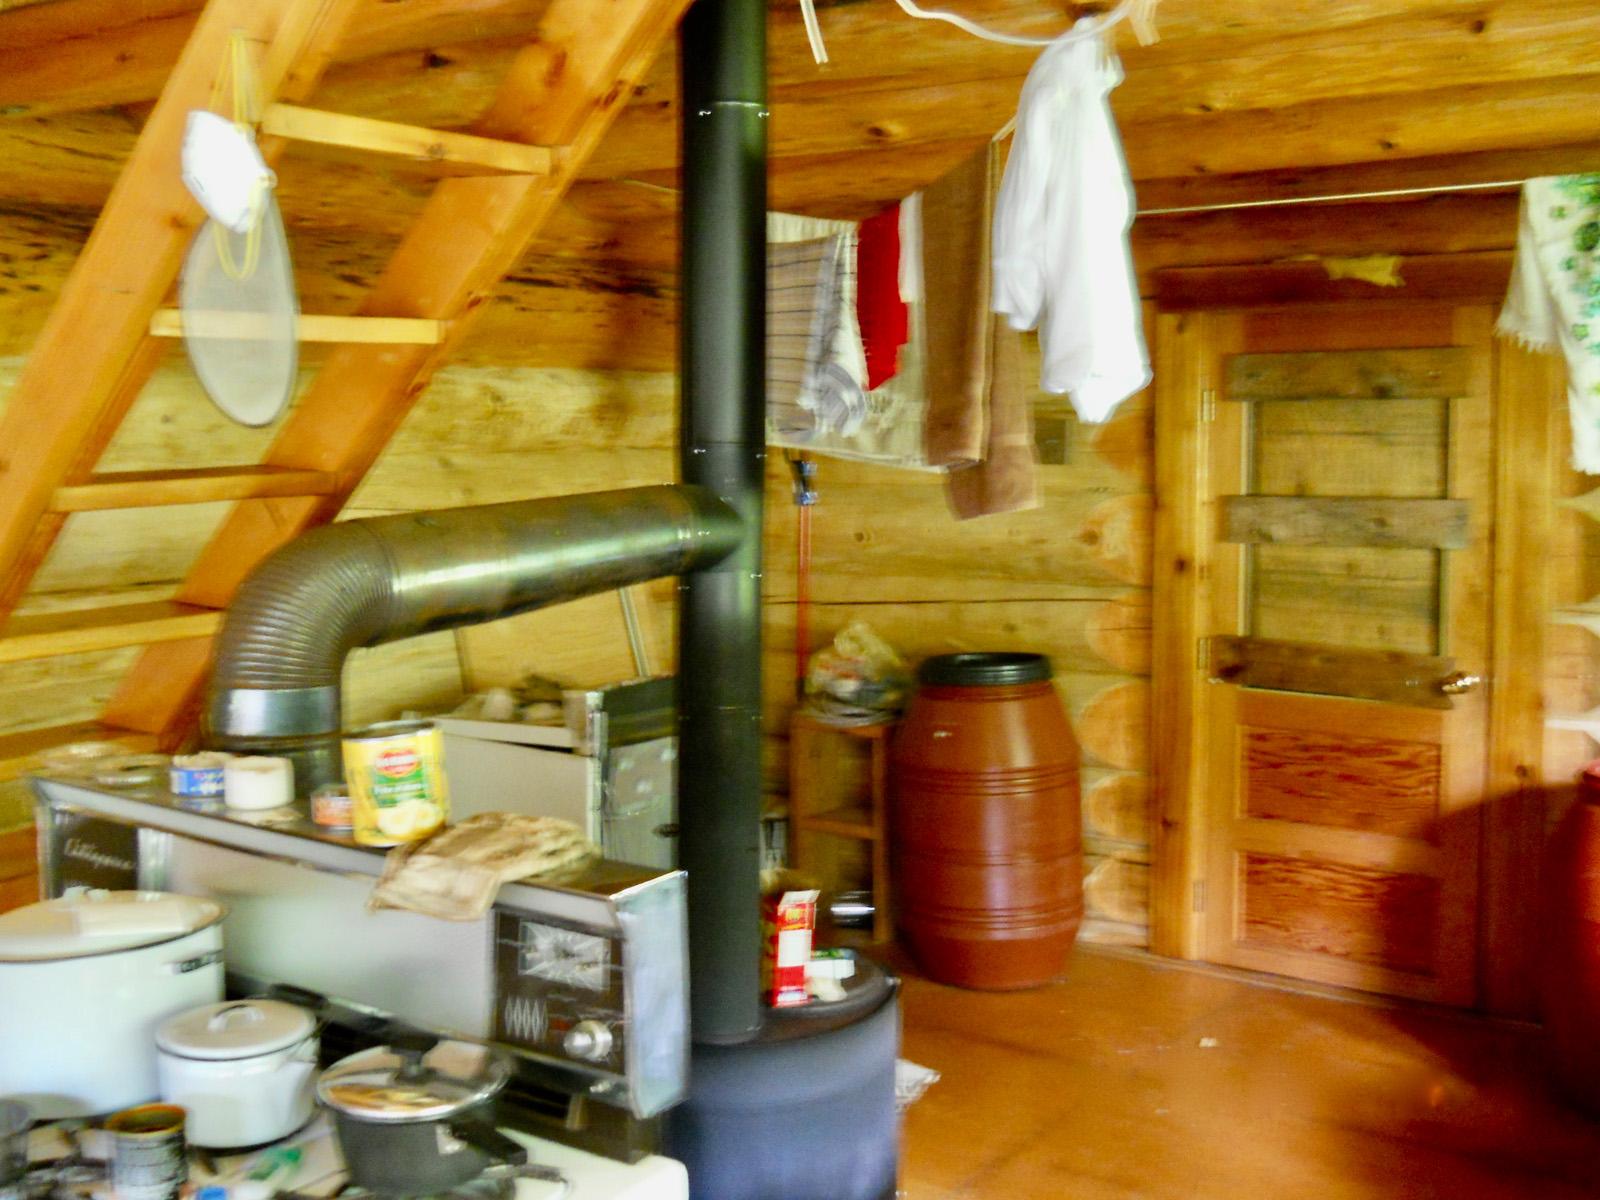 Cedarvale log cabin 07